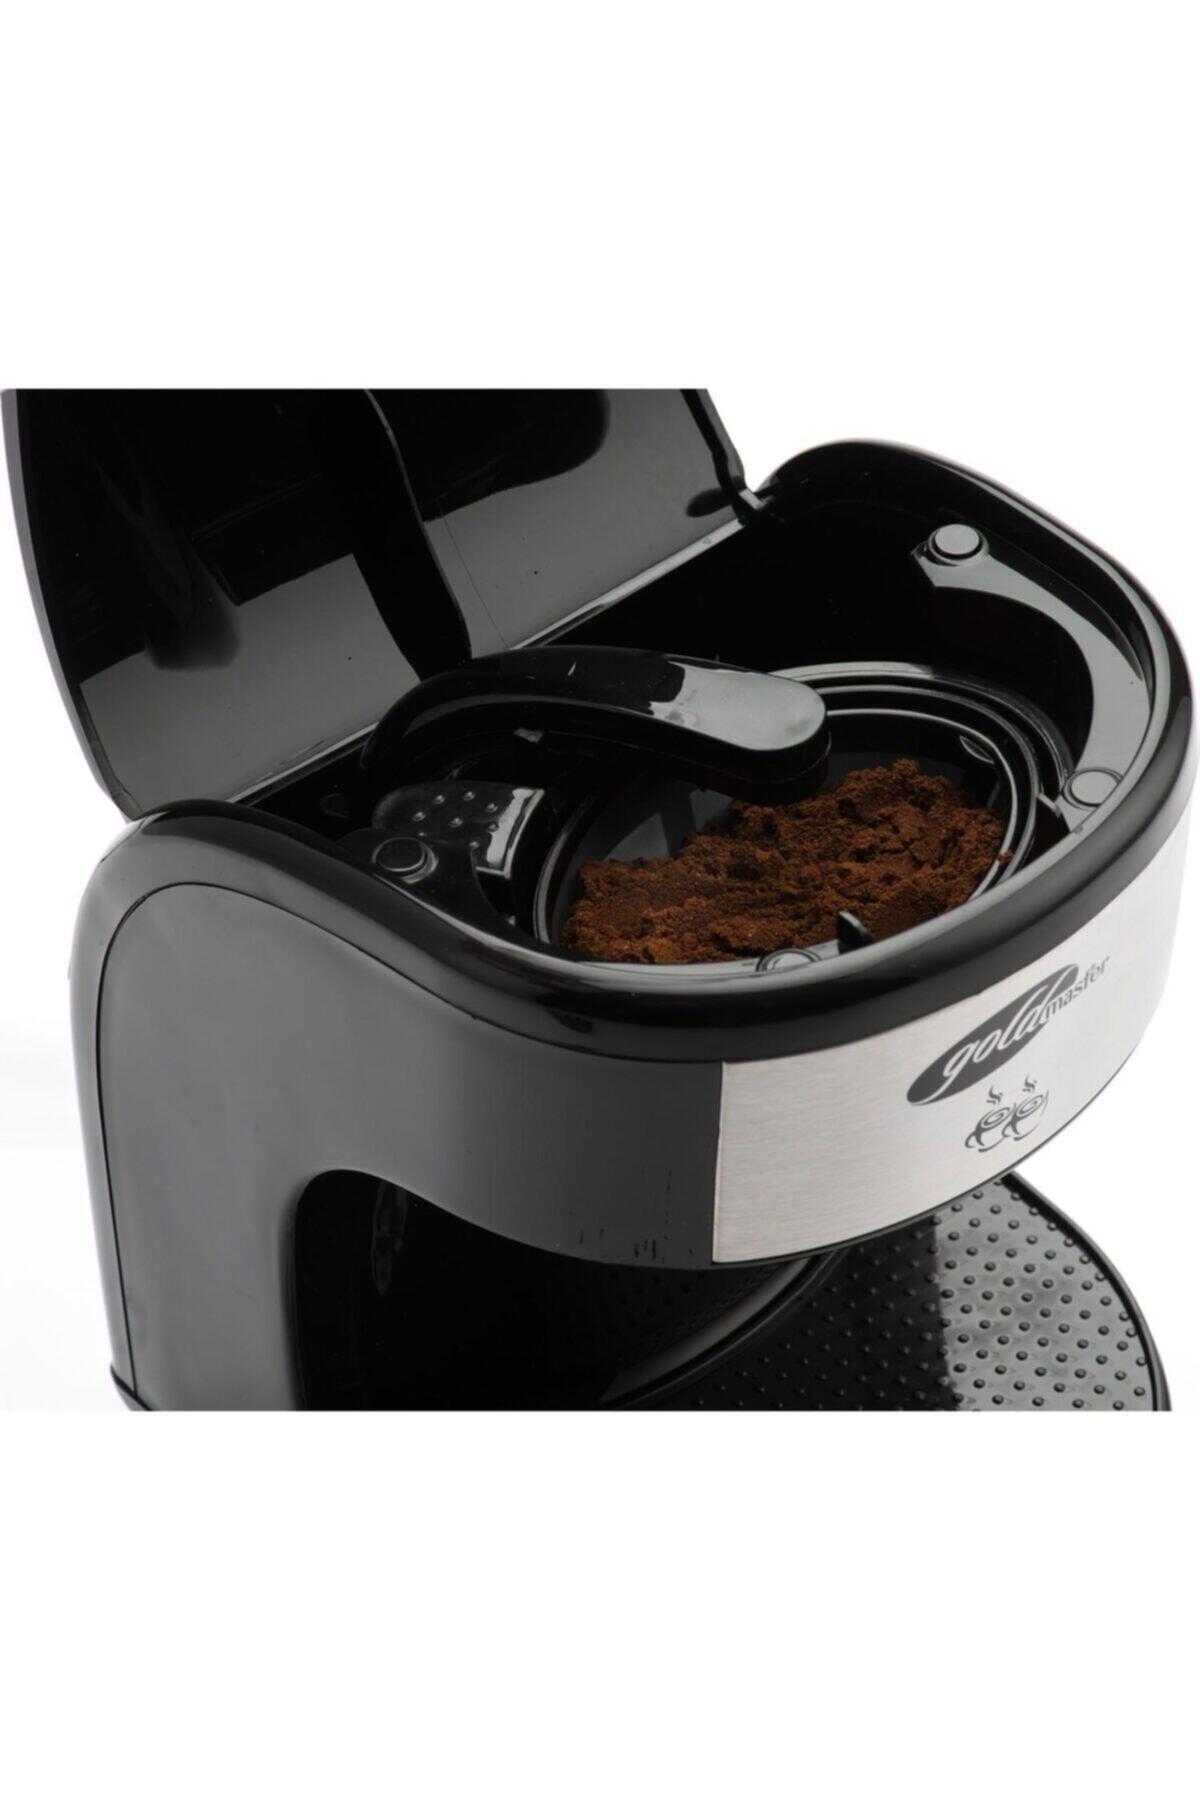 GOLDMASTER Gm 7351 Tutku Filtre Kahve Makinesi 2